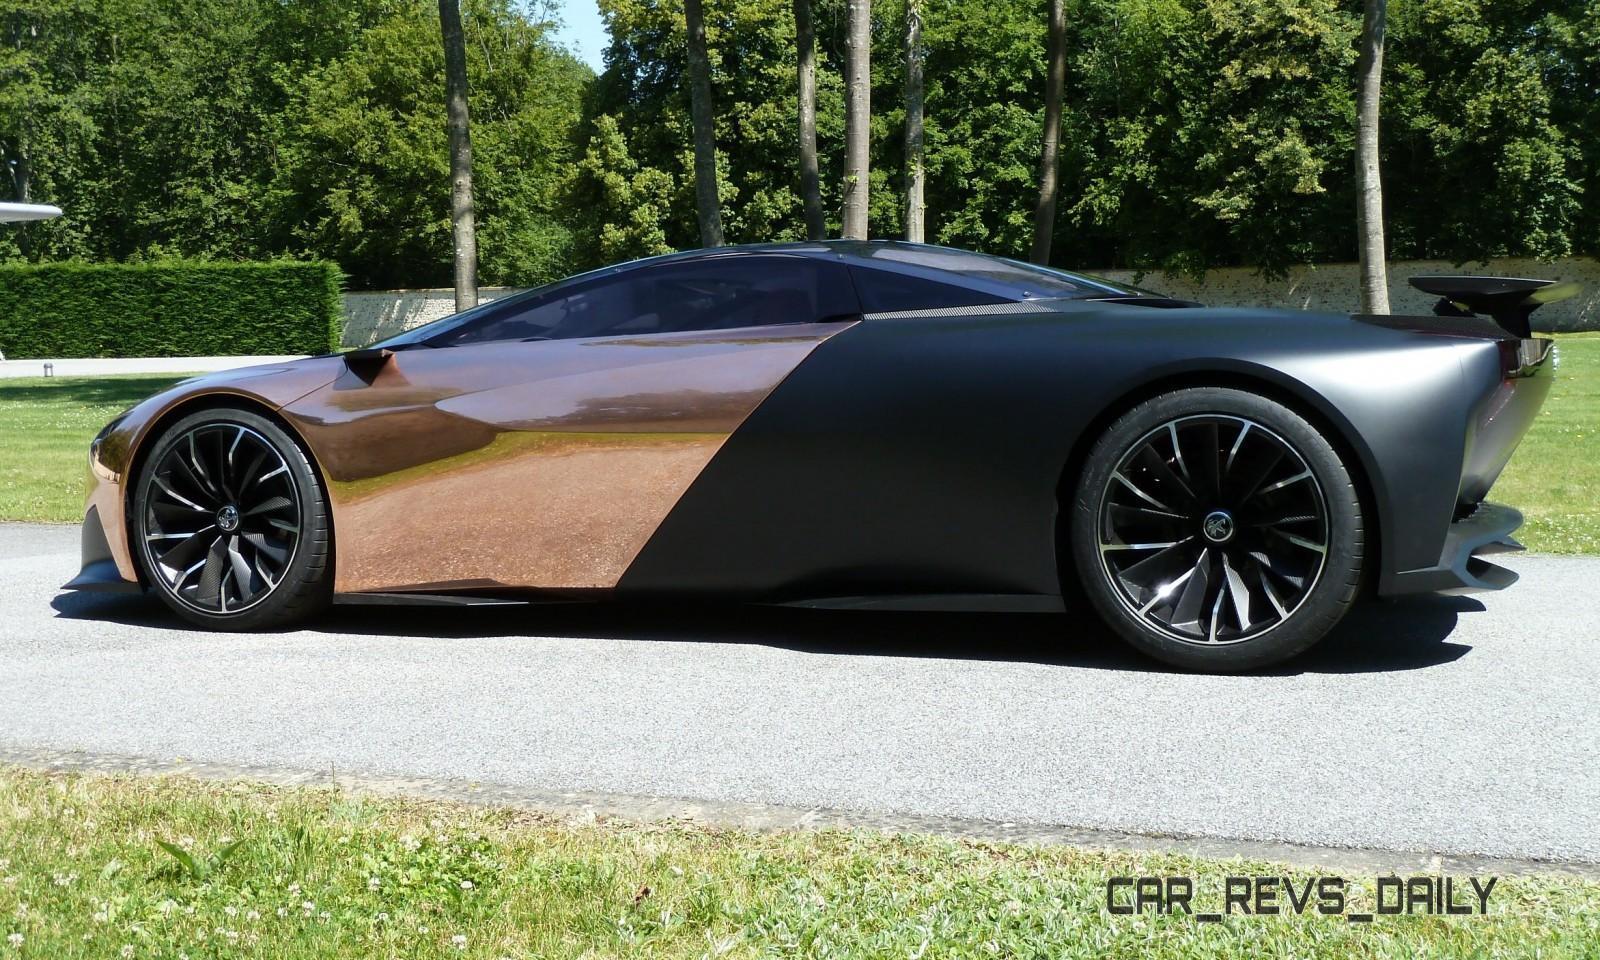 Concept Flashback - 2012 Peugeot ONYX Is Mixed-Media Hypercar Delight 28